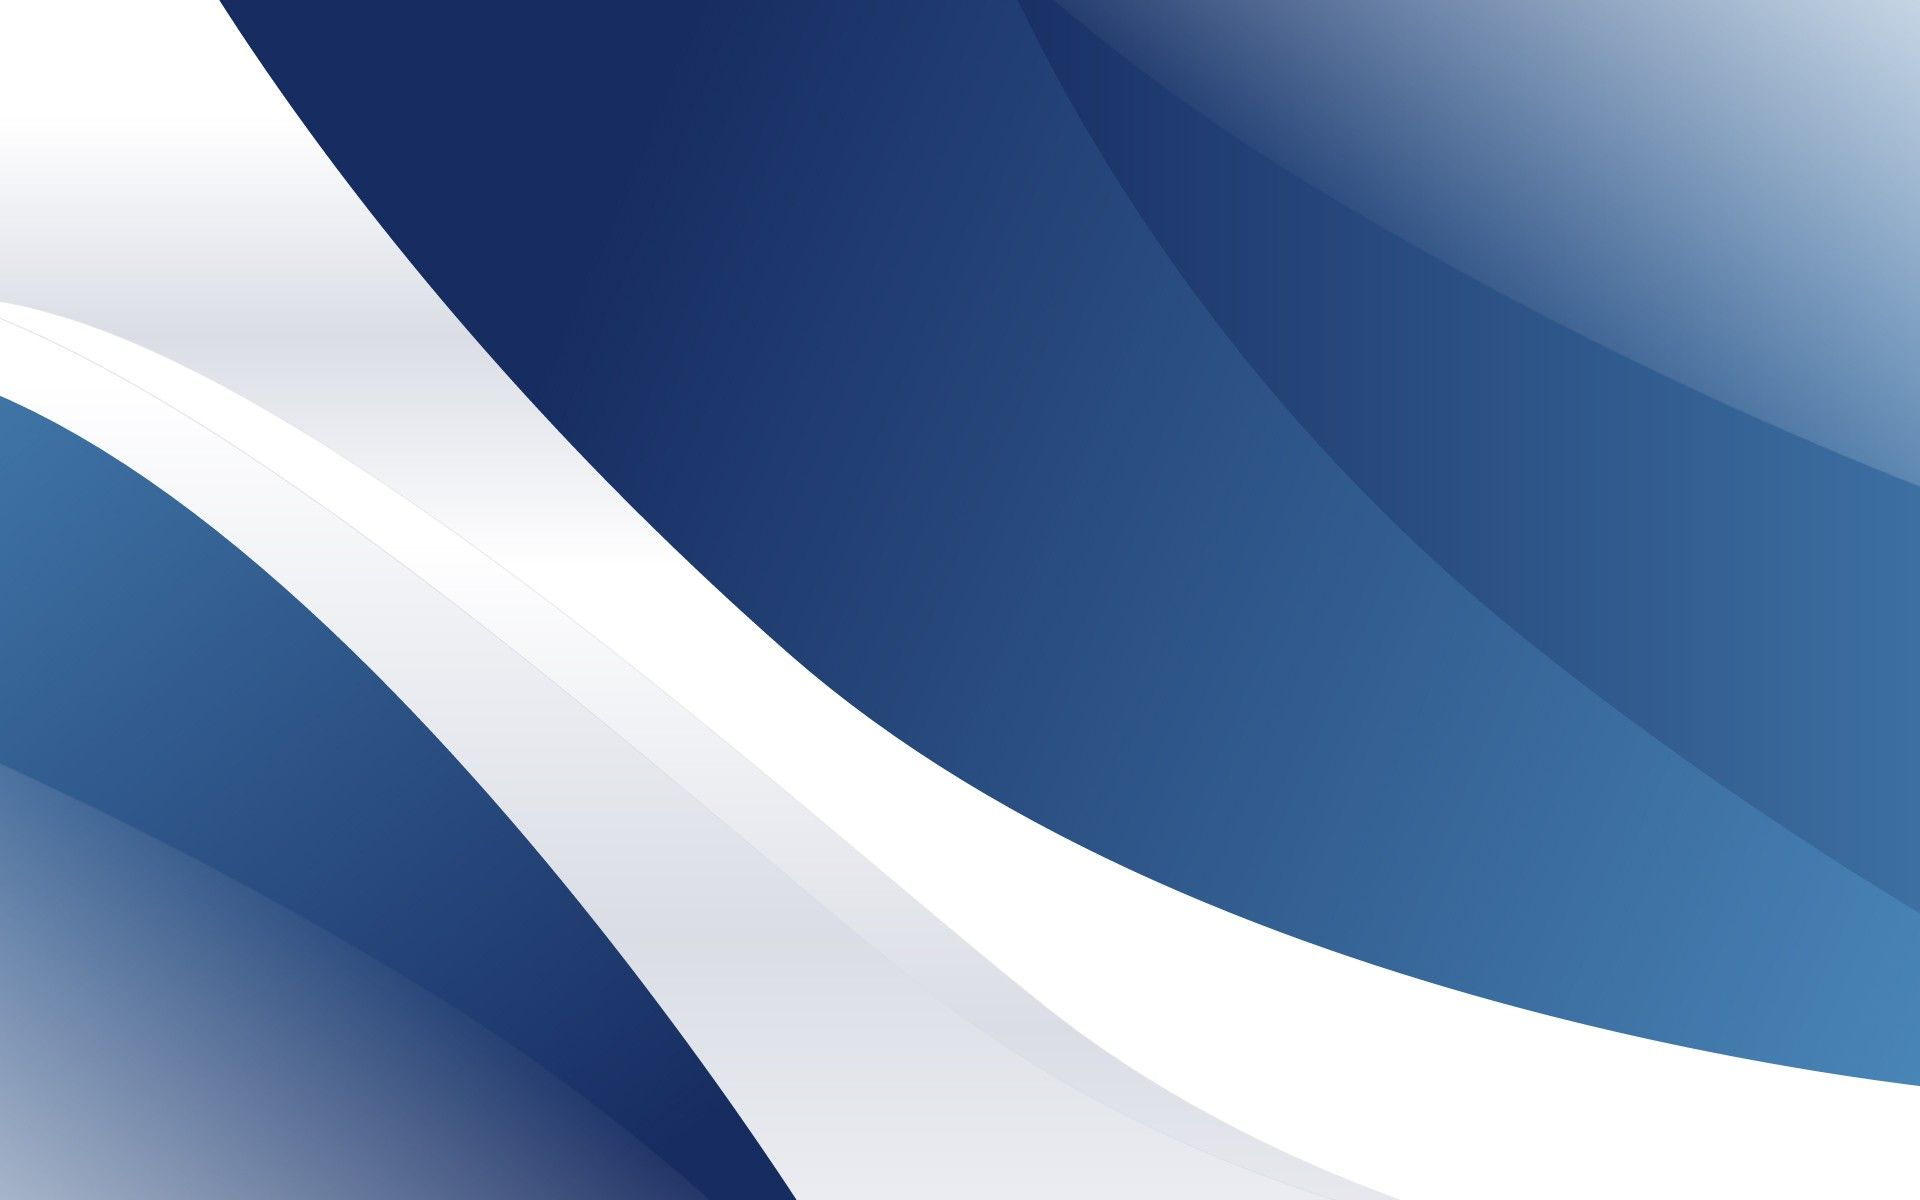 image for best hd wallpaper gookep mca mca mouloudia club alger foot ball sport inspiration art design pinterest